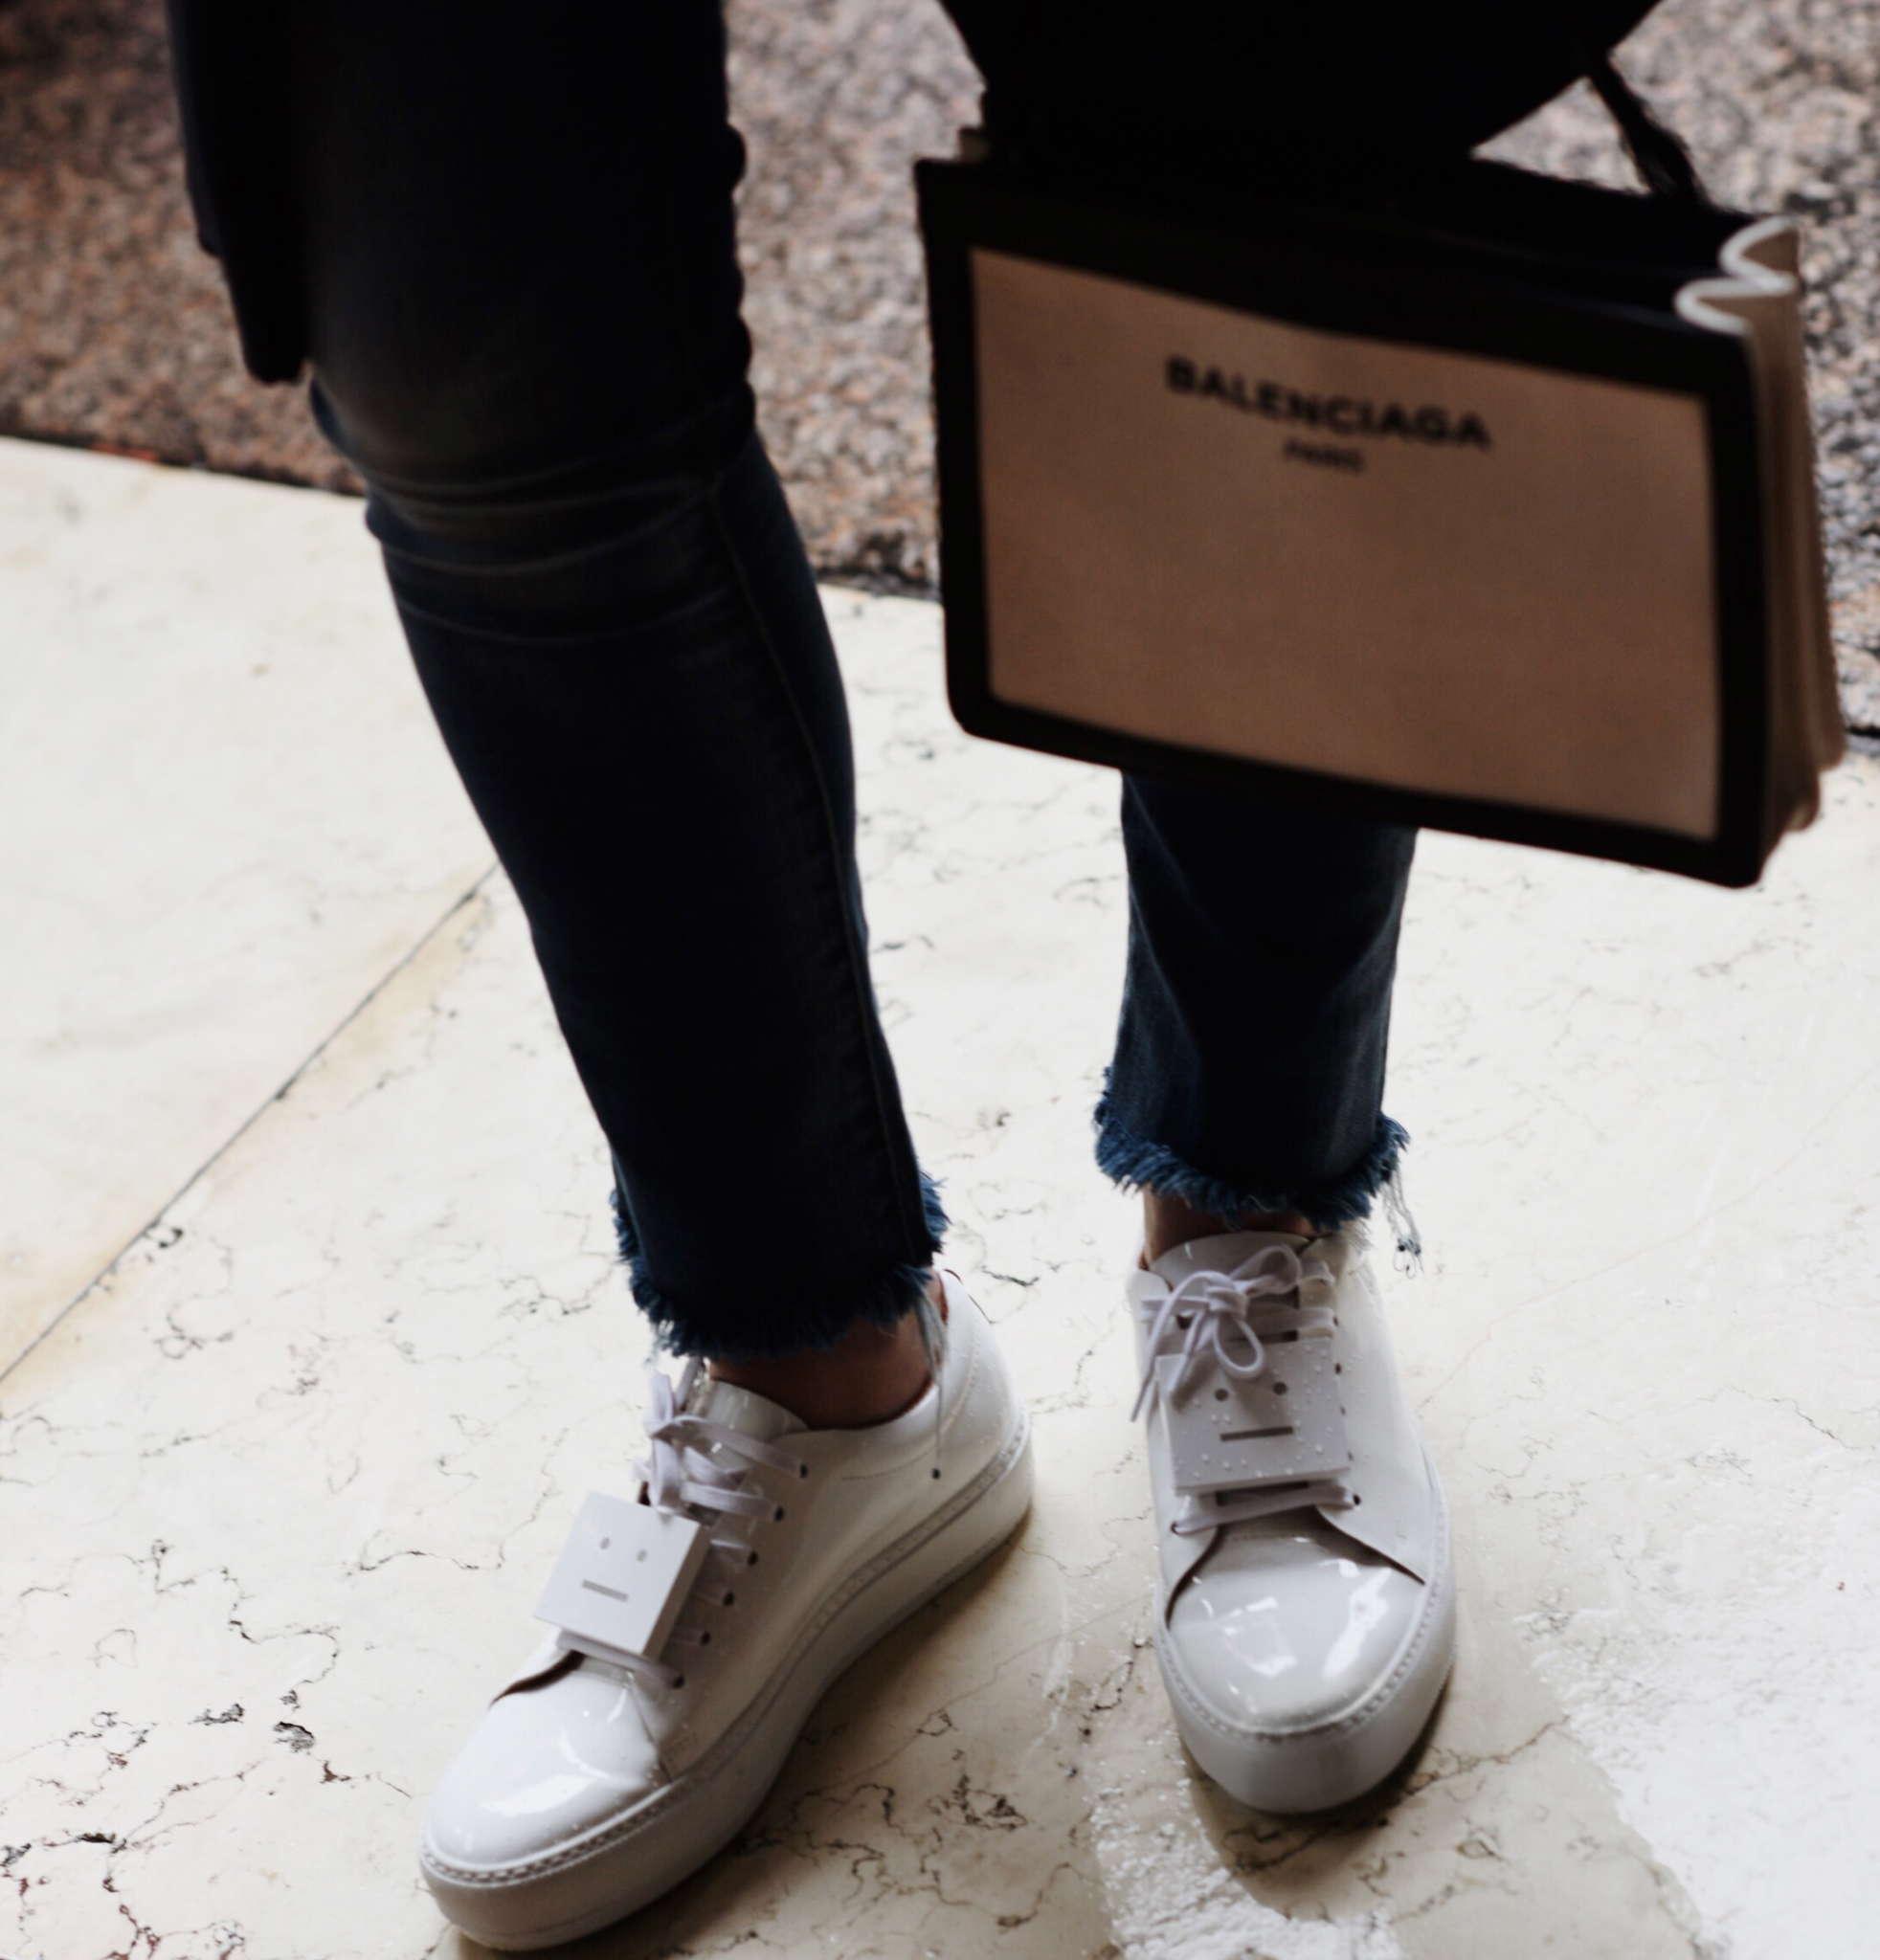 acne-studios-adriana-sneakers-balenciaga-pochette-crossbody-bag-DOUUOD-coat-frayed-hem-jeans-rika-studios-spellonme-personalised-bracelet-ulrika-lundgren-white-shirt-white-sneakers-MFW